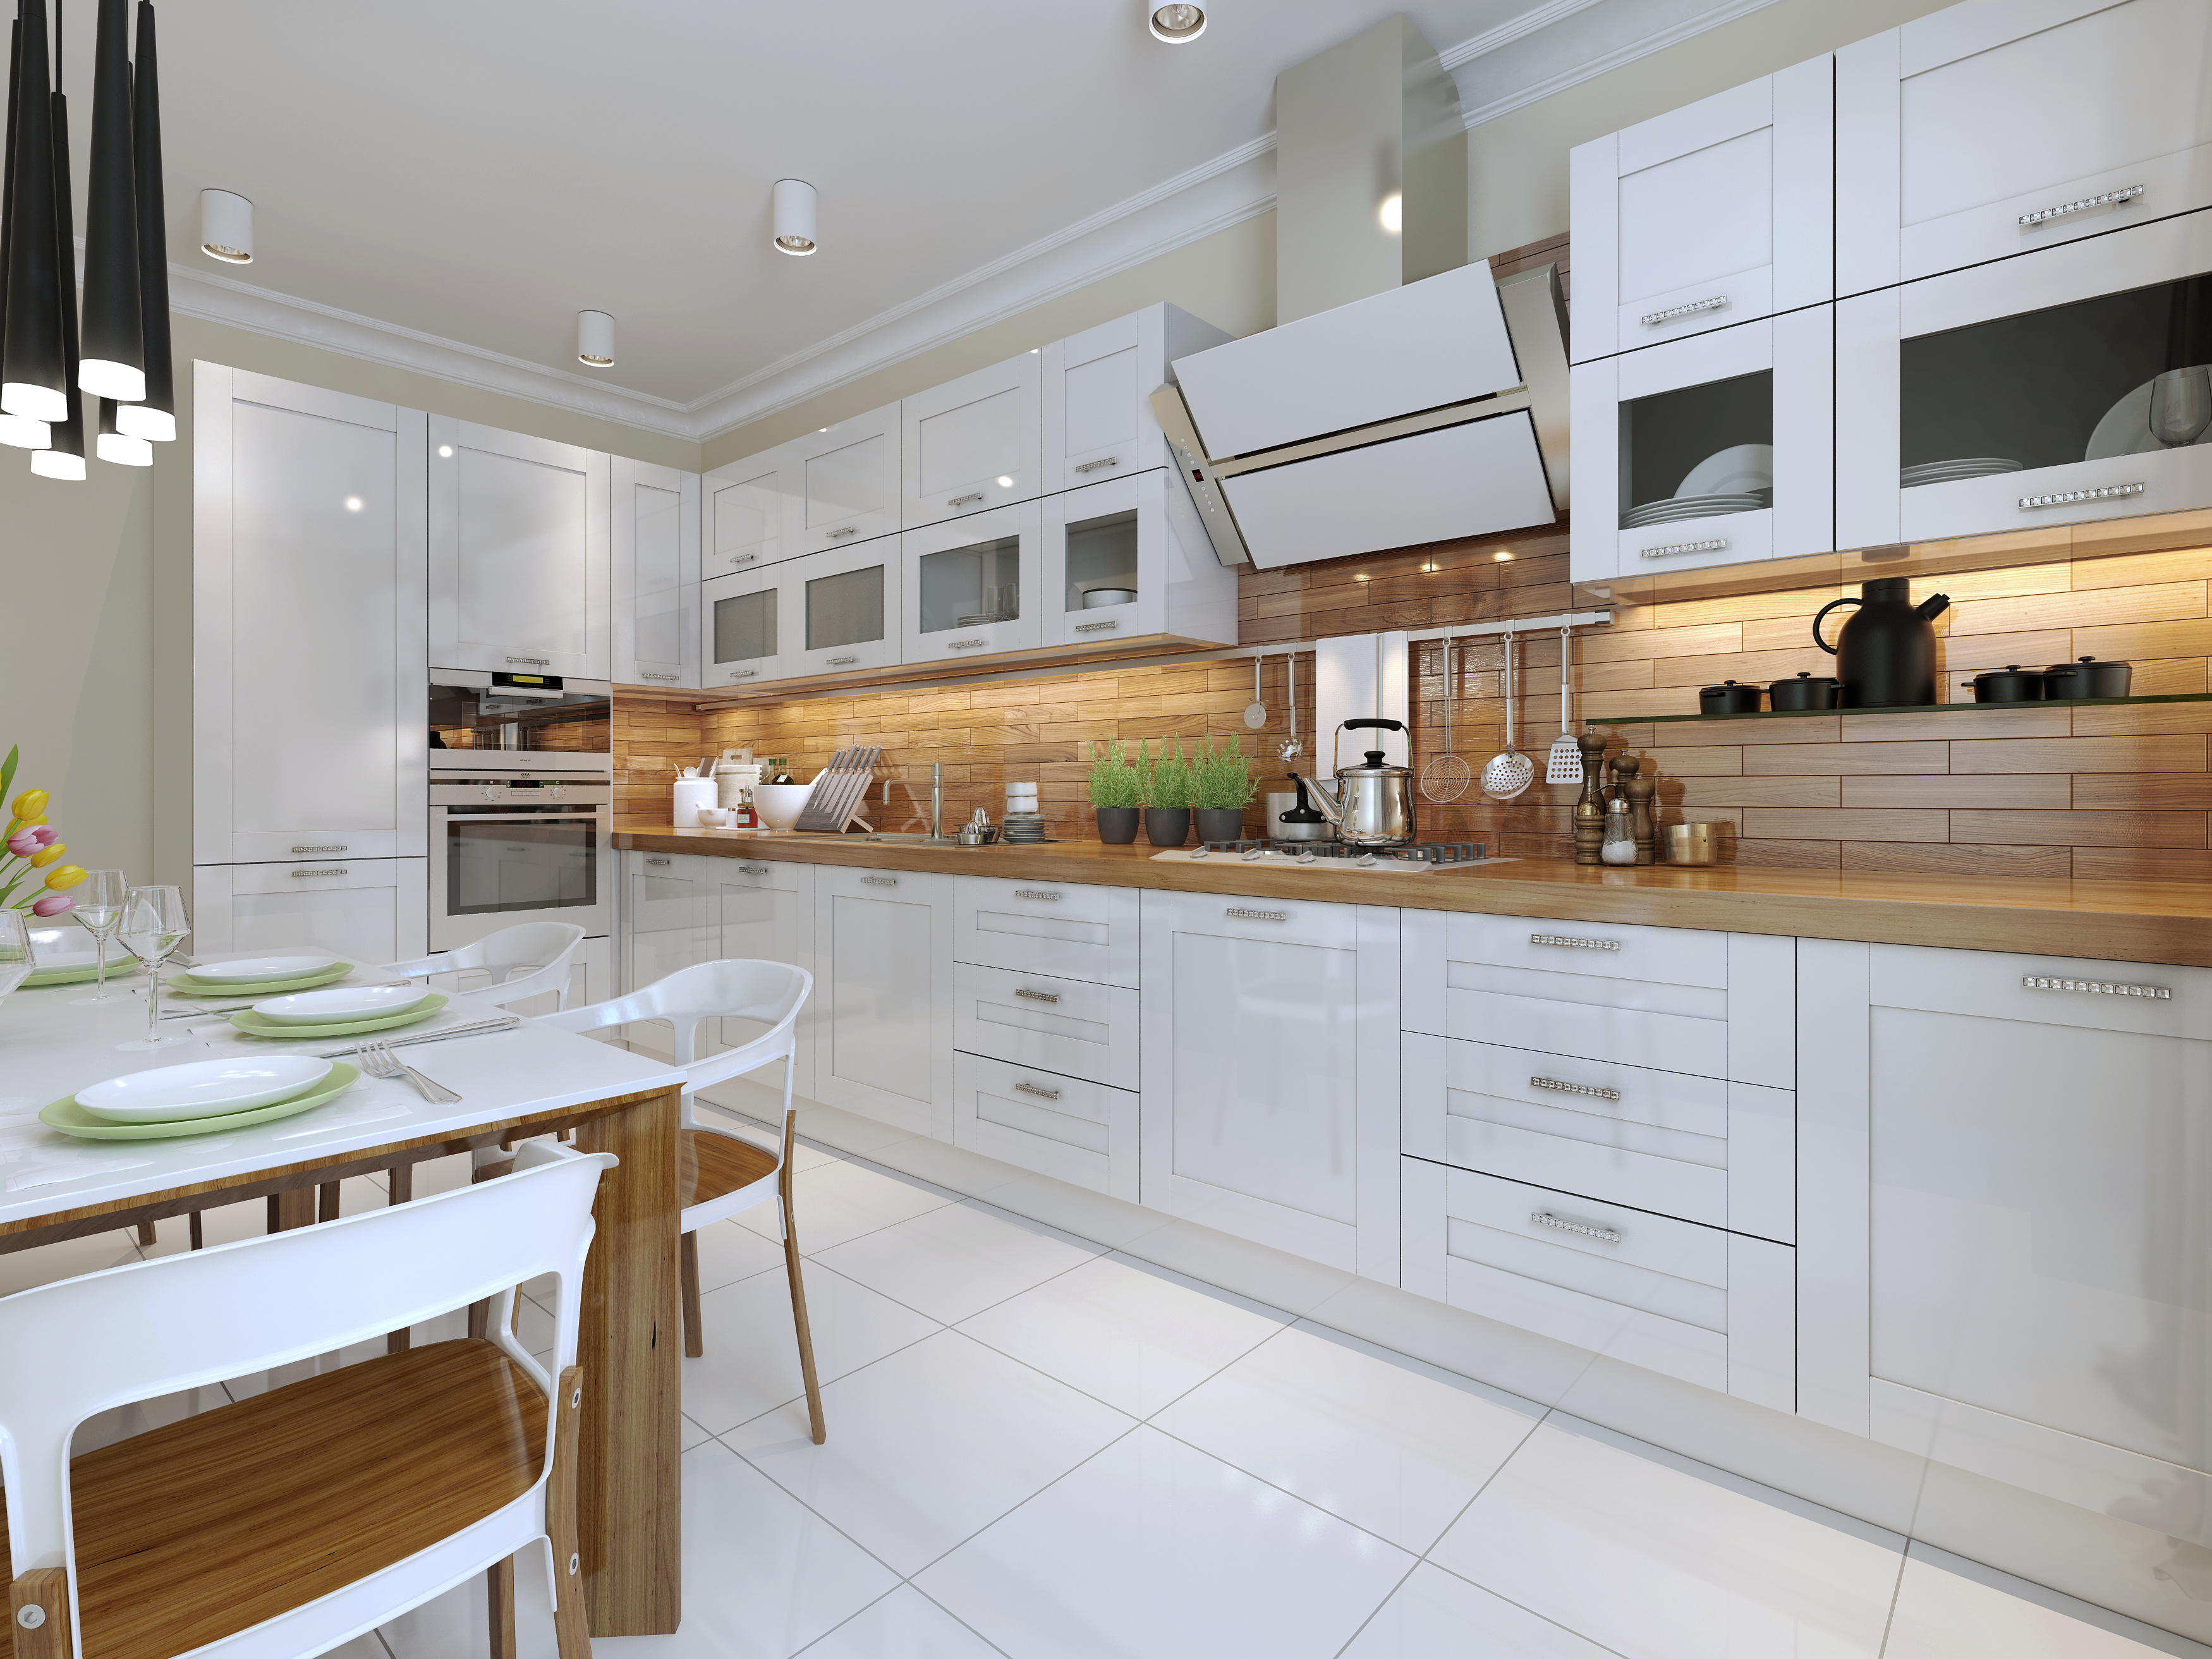 ele gant velvet itali an luxury modern kitchen with black cabis